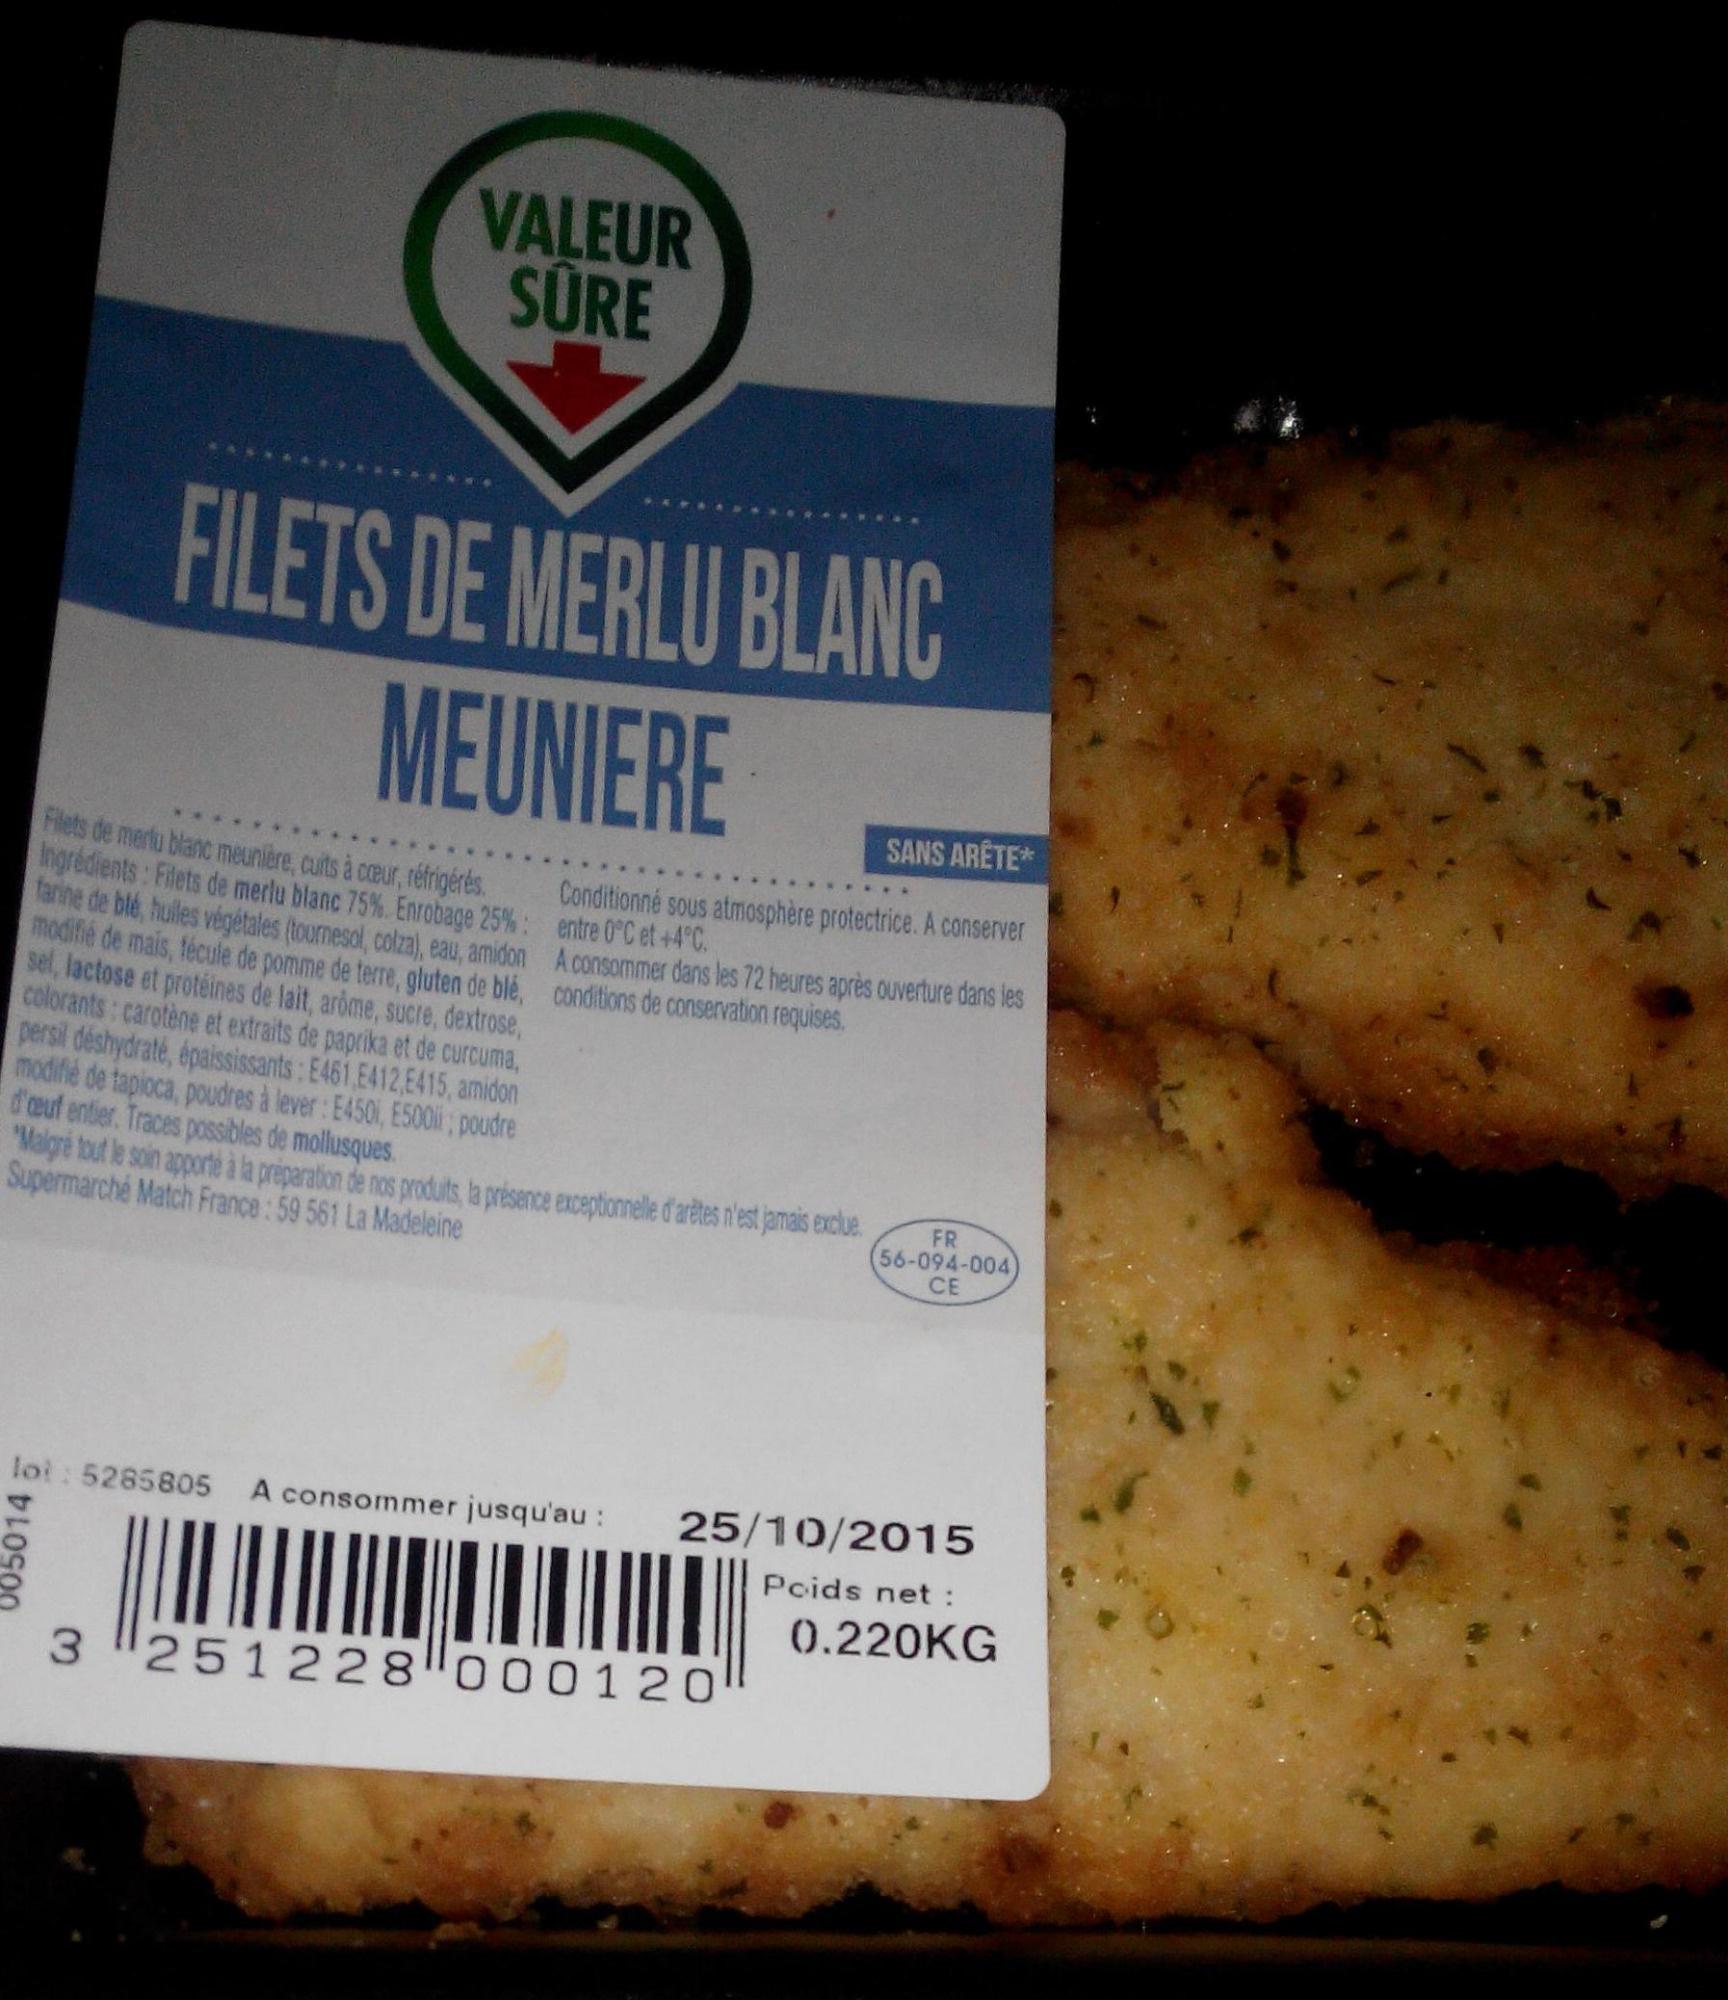 Filets de Merlu blanc meuniere - Product - fr